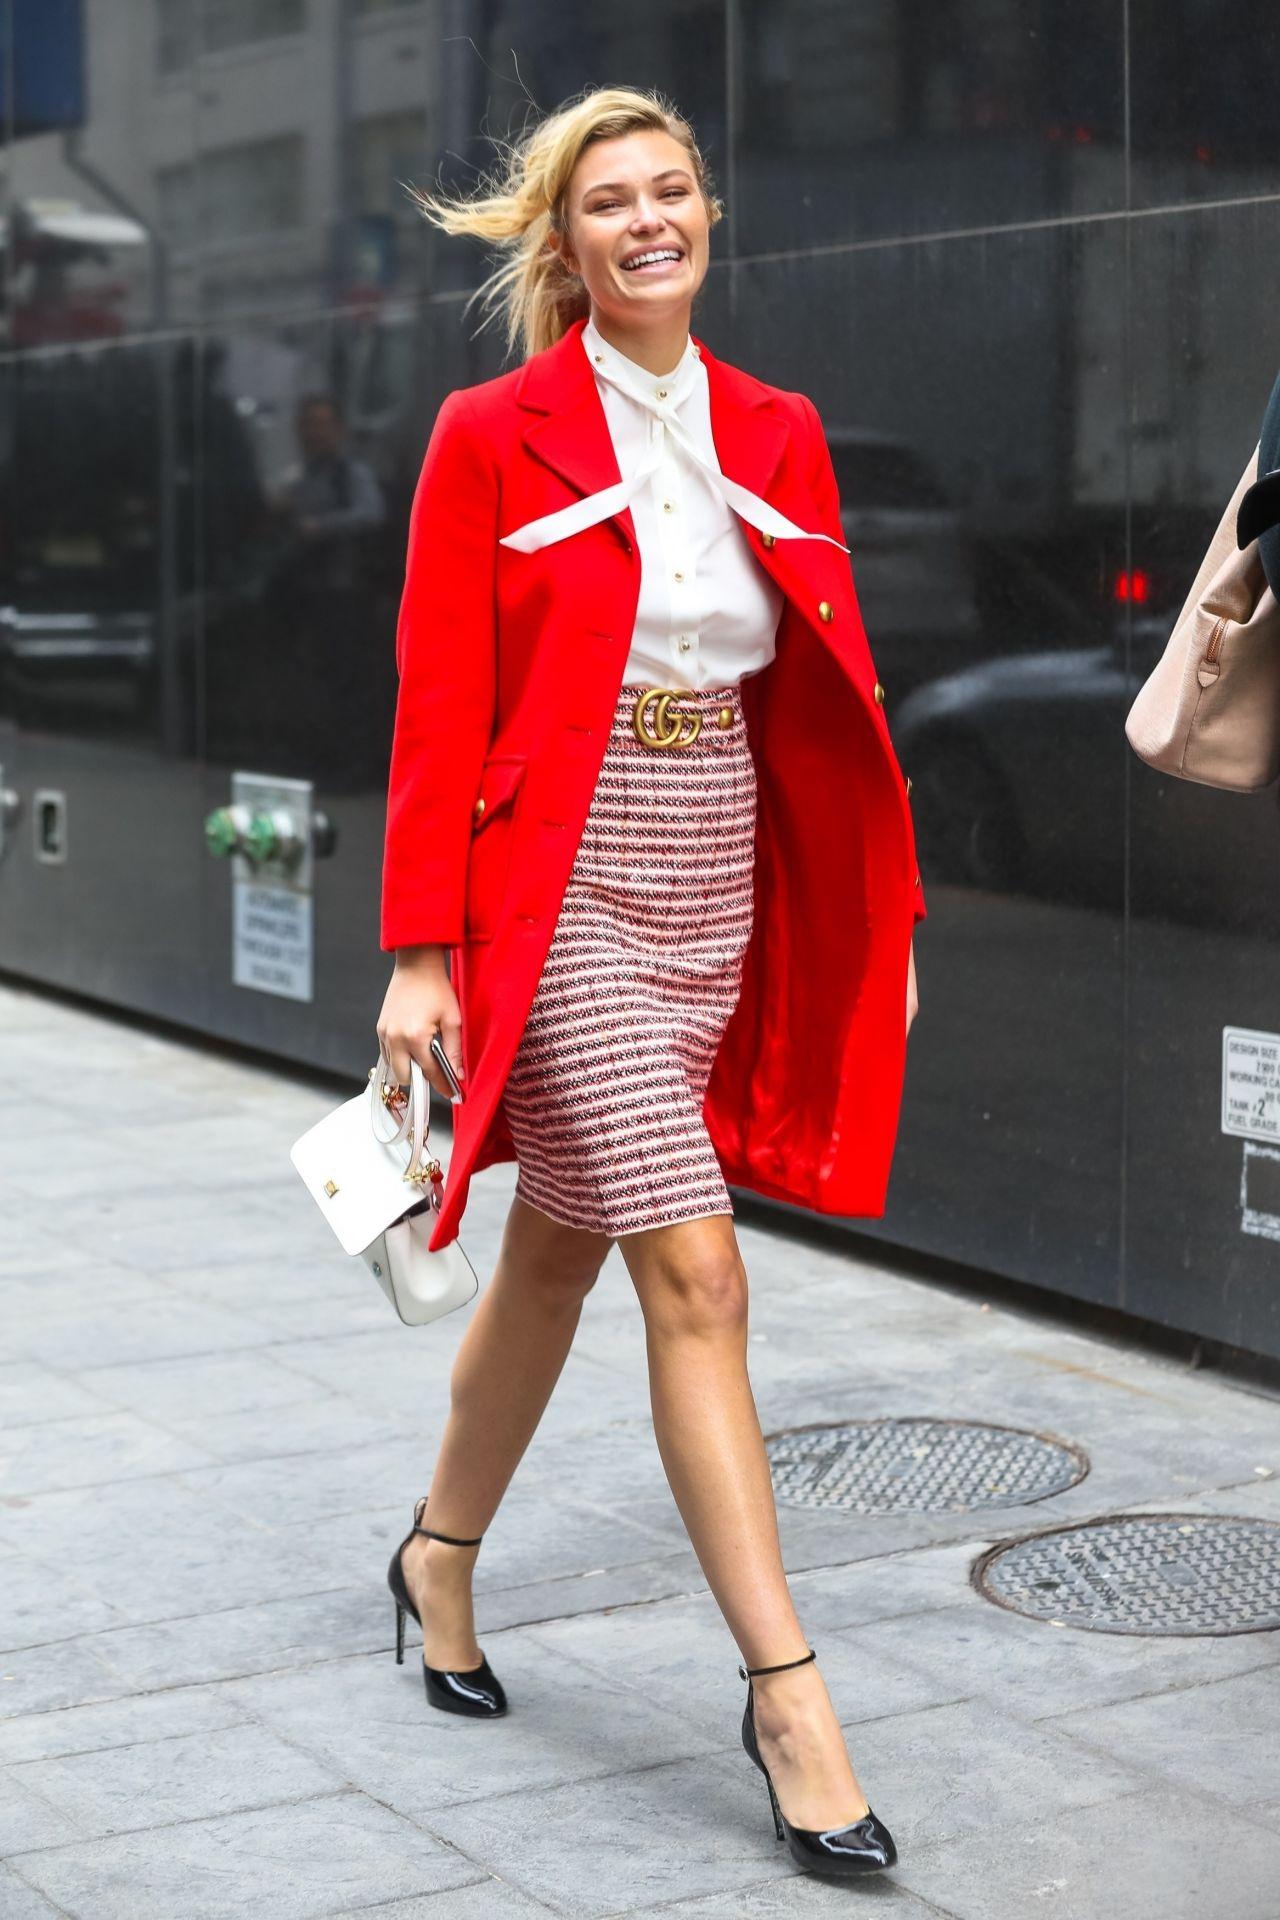 Tanya burr celebrity style jewelry